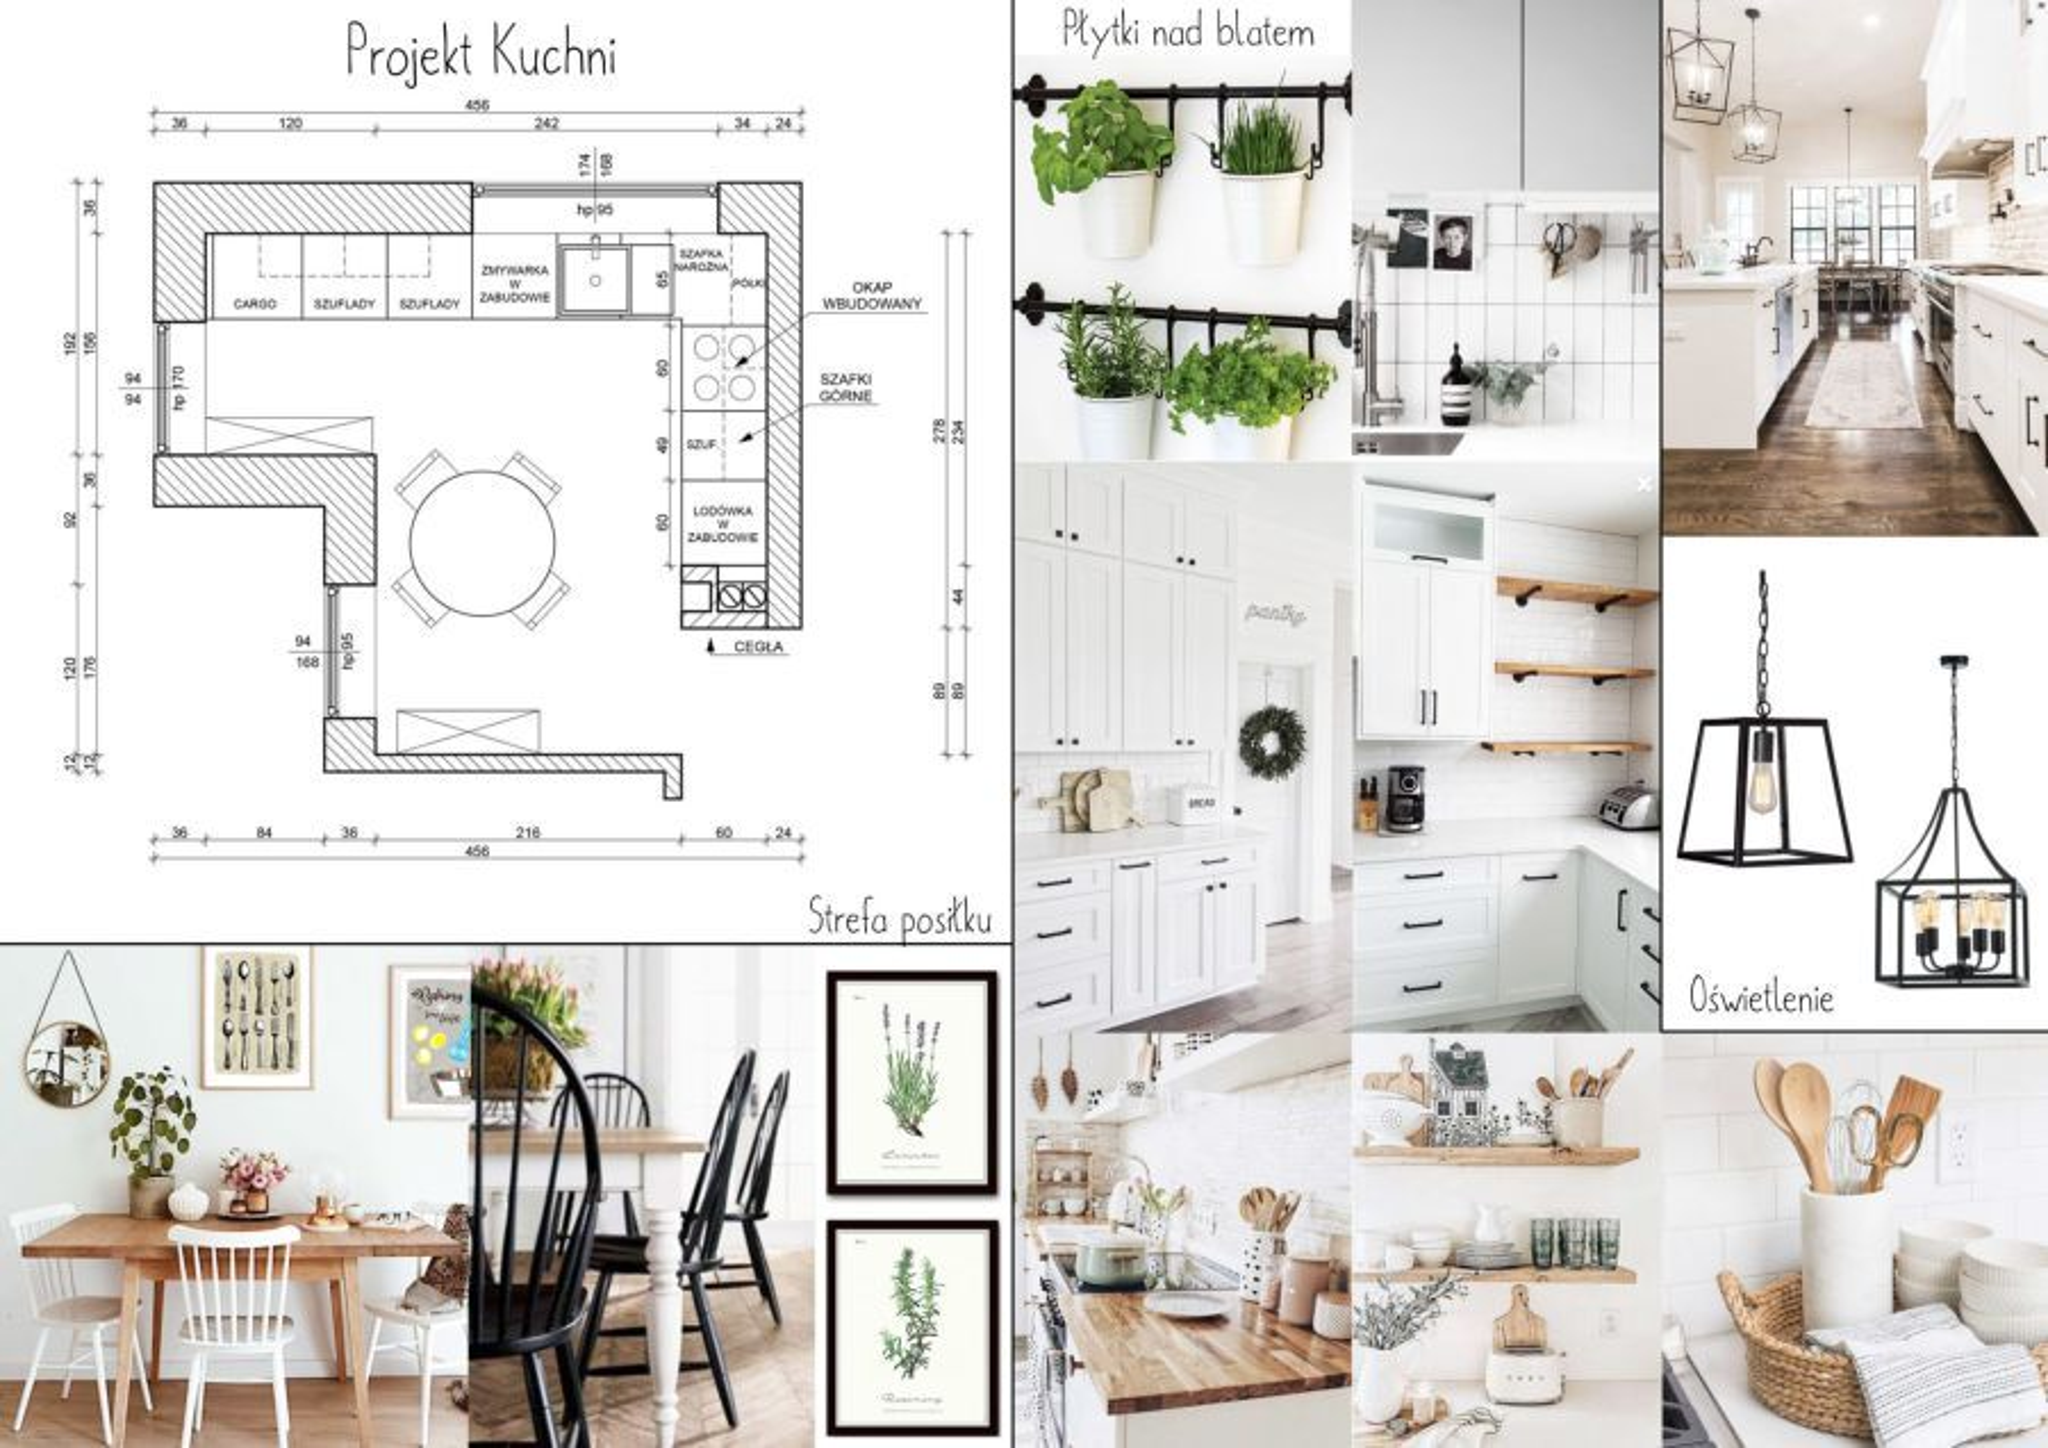 planowanie remontu kuchni kuchnia skandynawska projekt kuchni